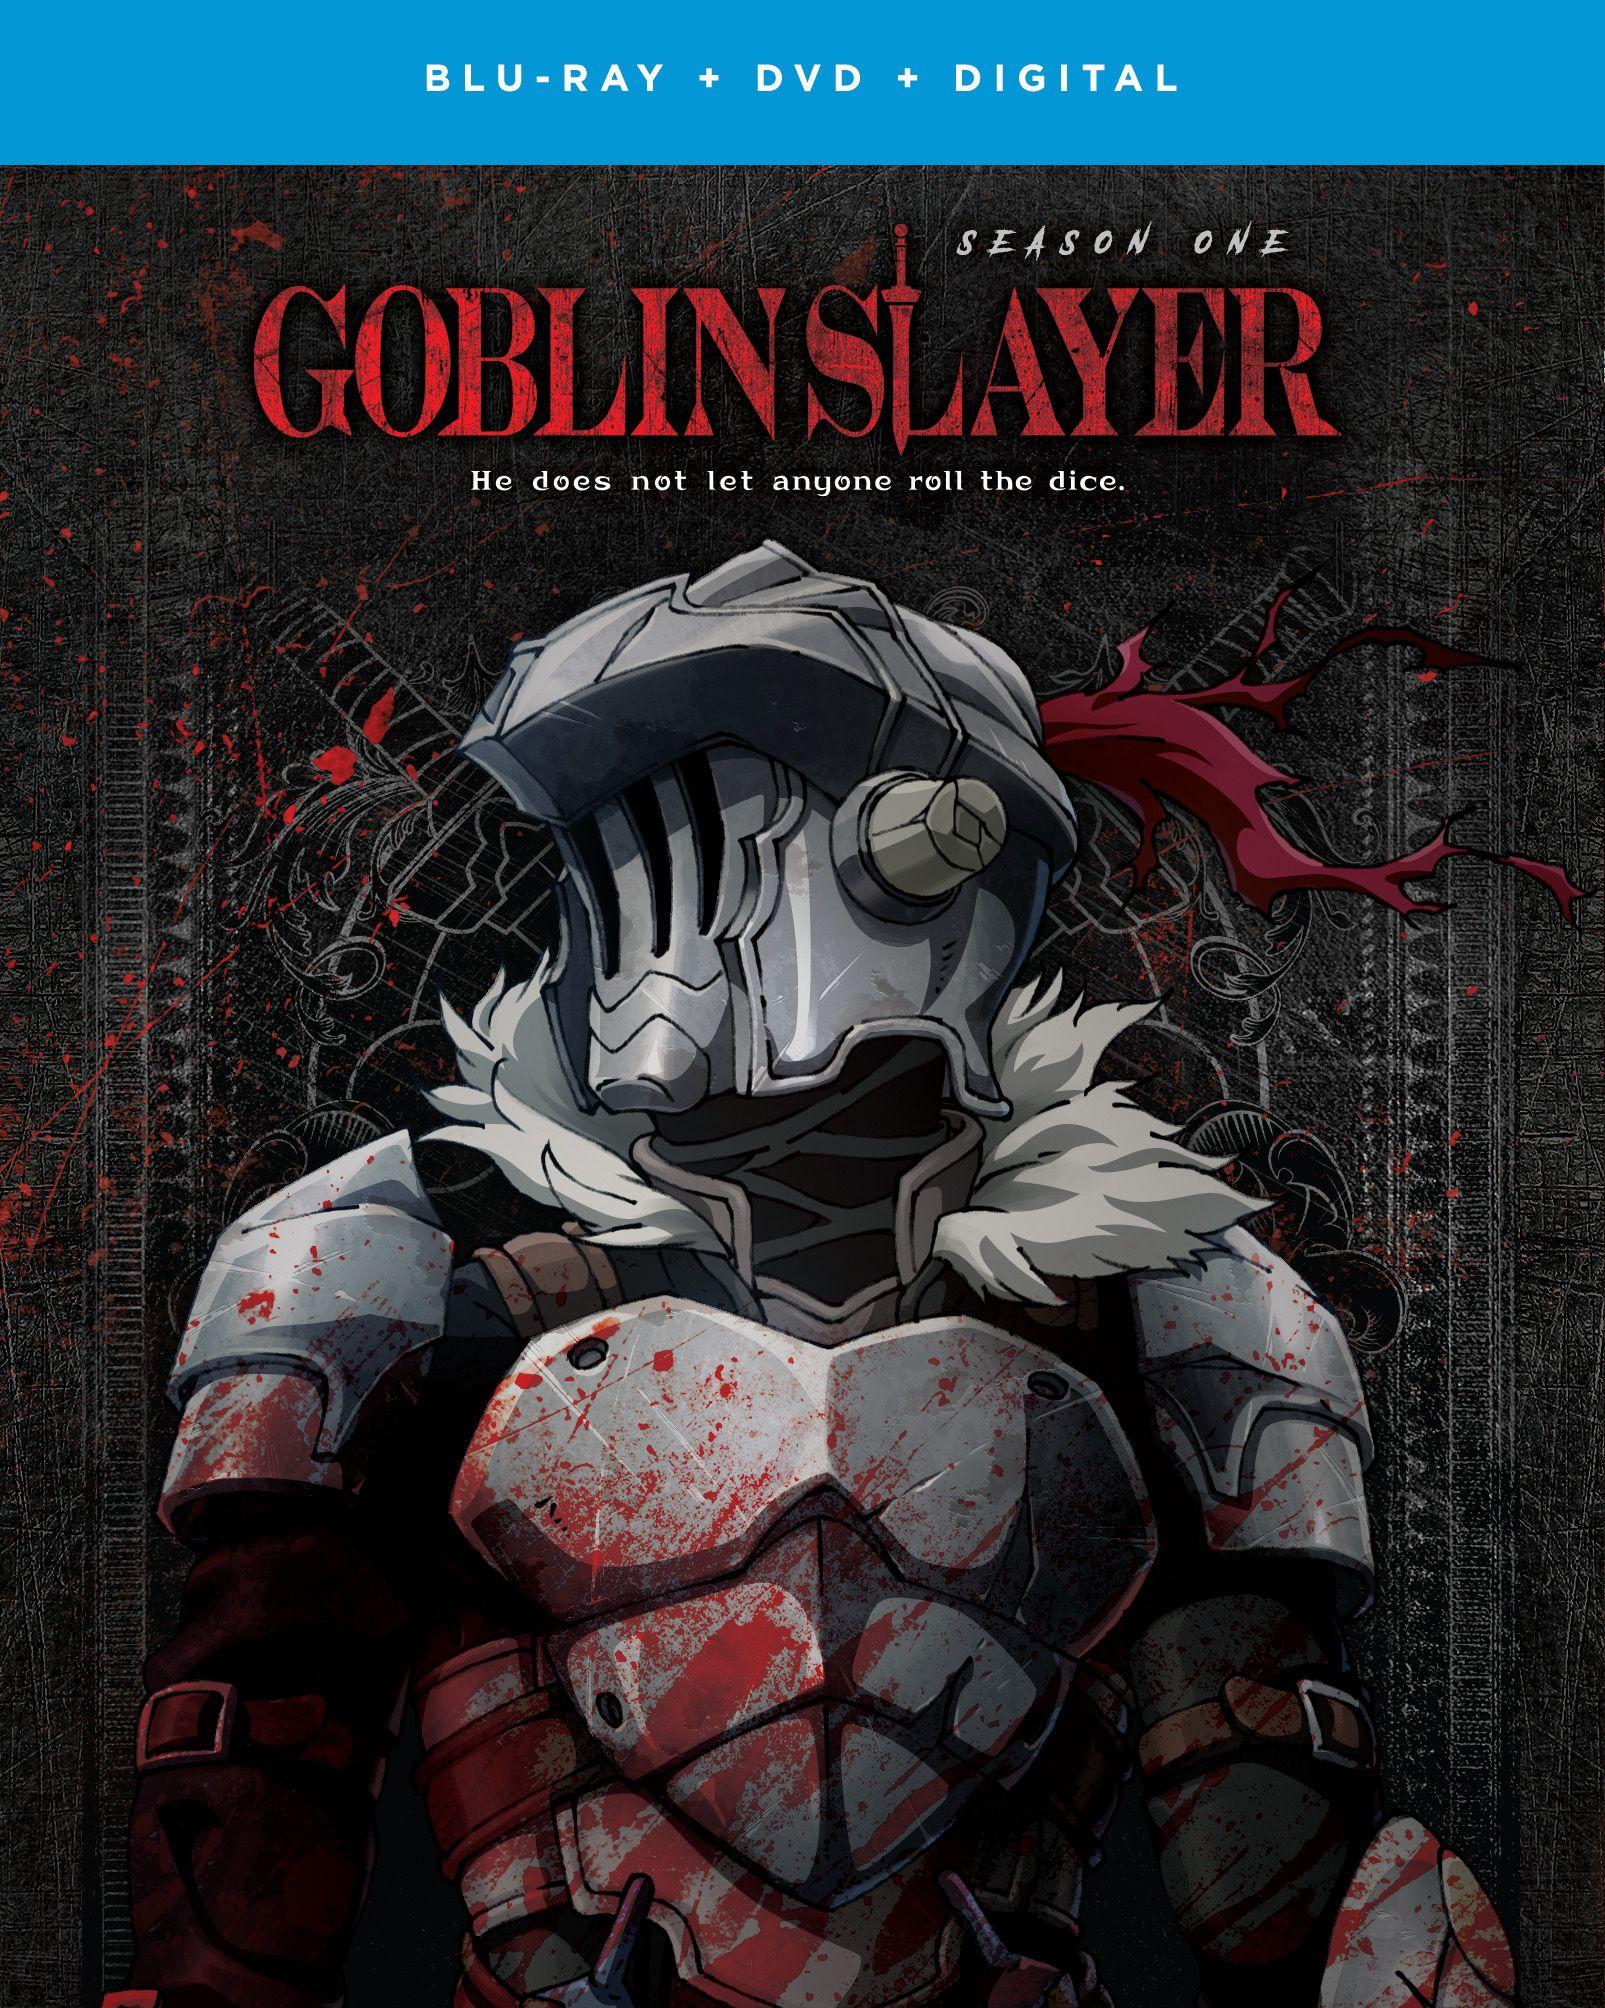 Goblin Slayer in 2020 Slayer, Goblin, Slayer meme